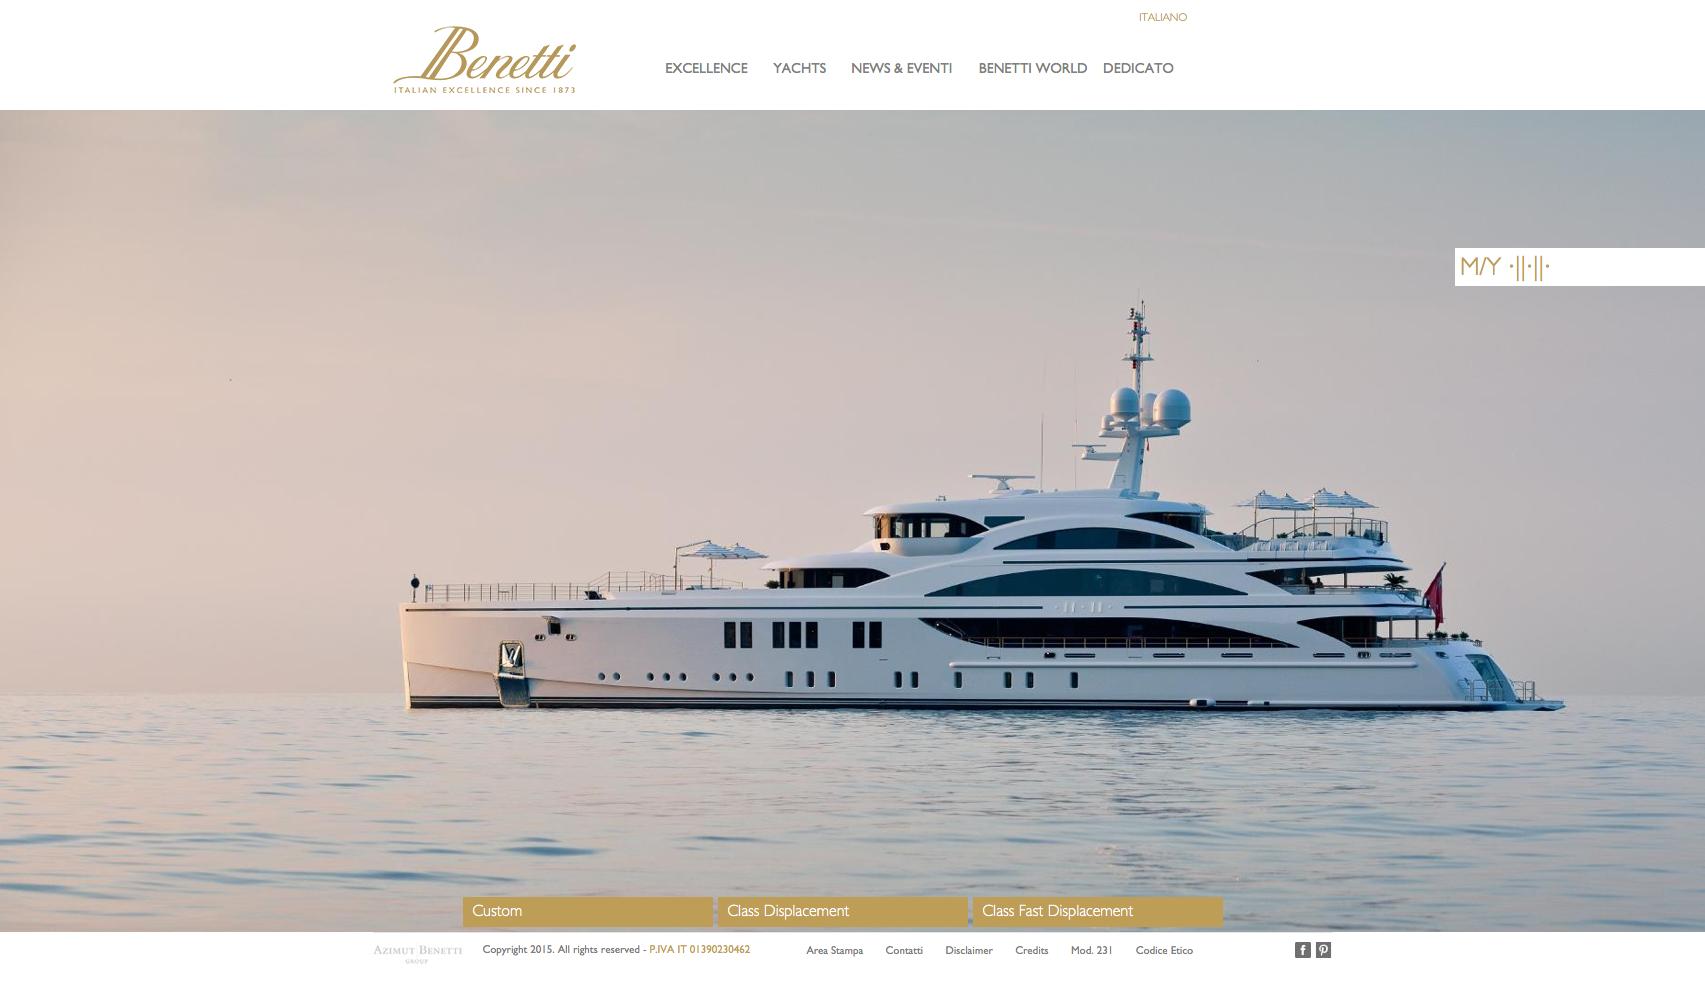 BmTec Benetti Yachts